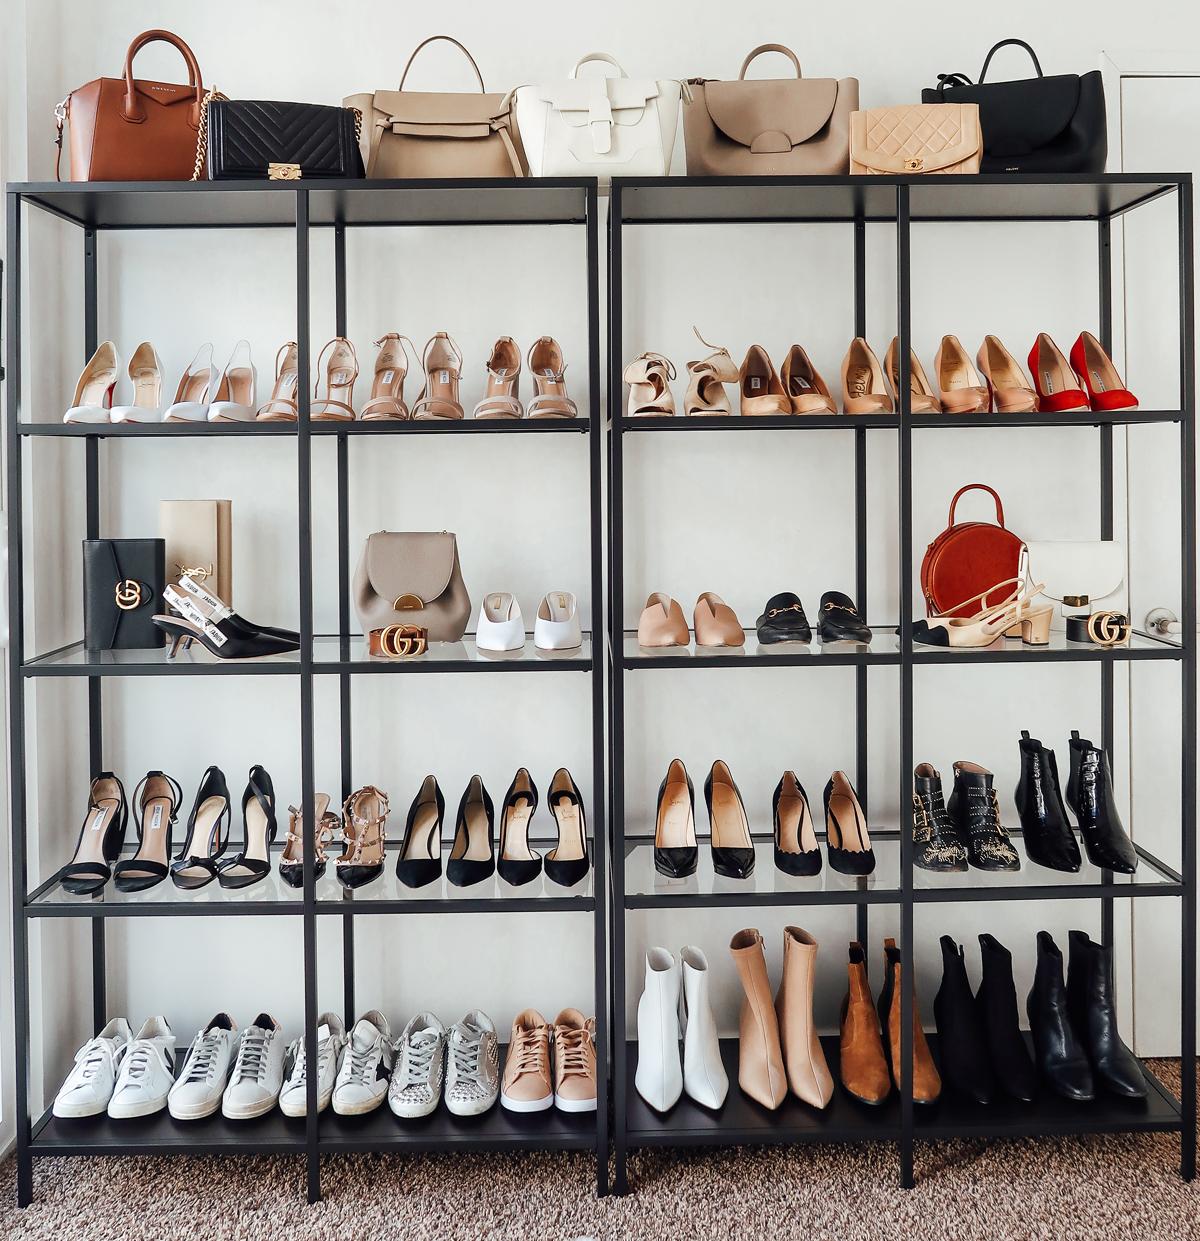 70cadc8cc4a Fashion Jackson Handbag Shoe Collection Closet Office Shelf Storage